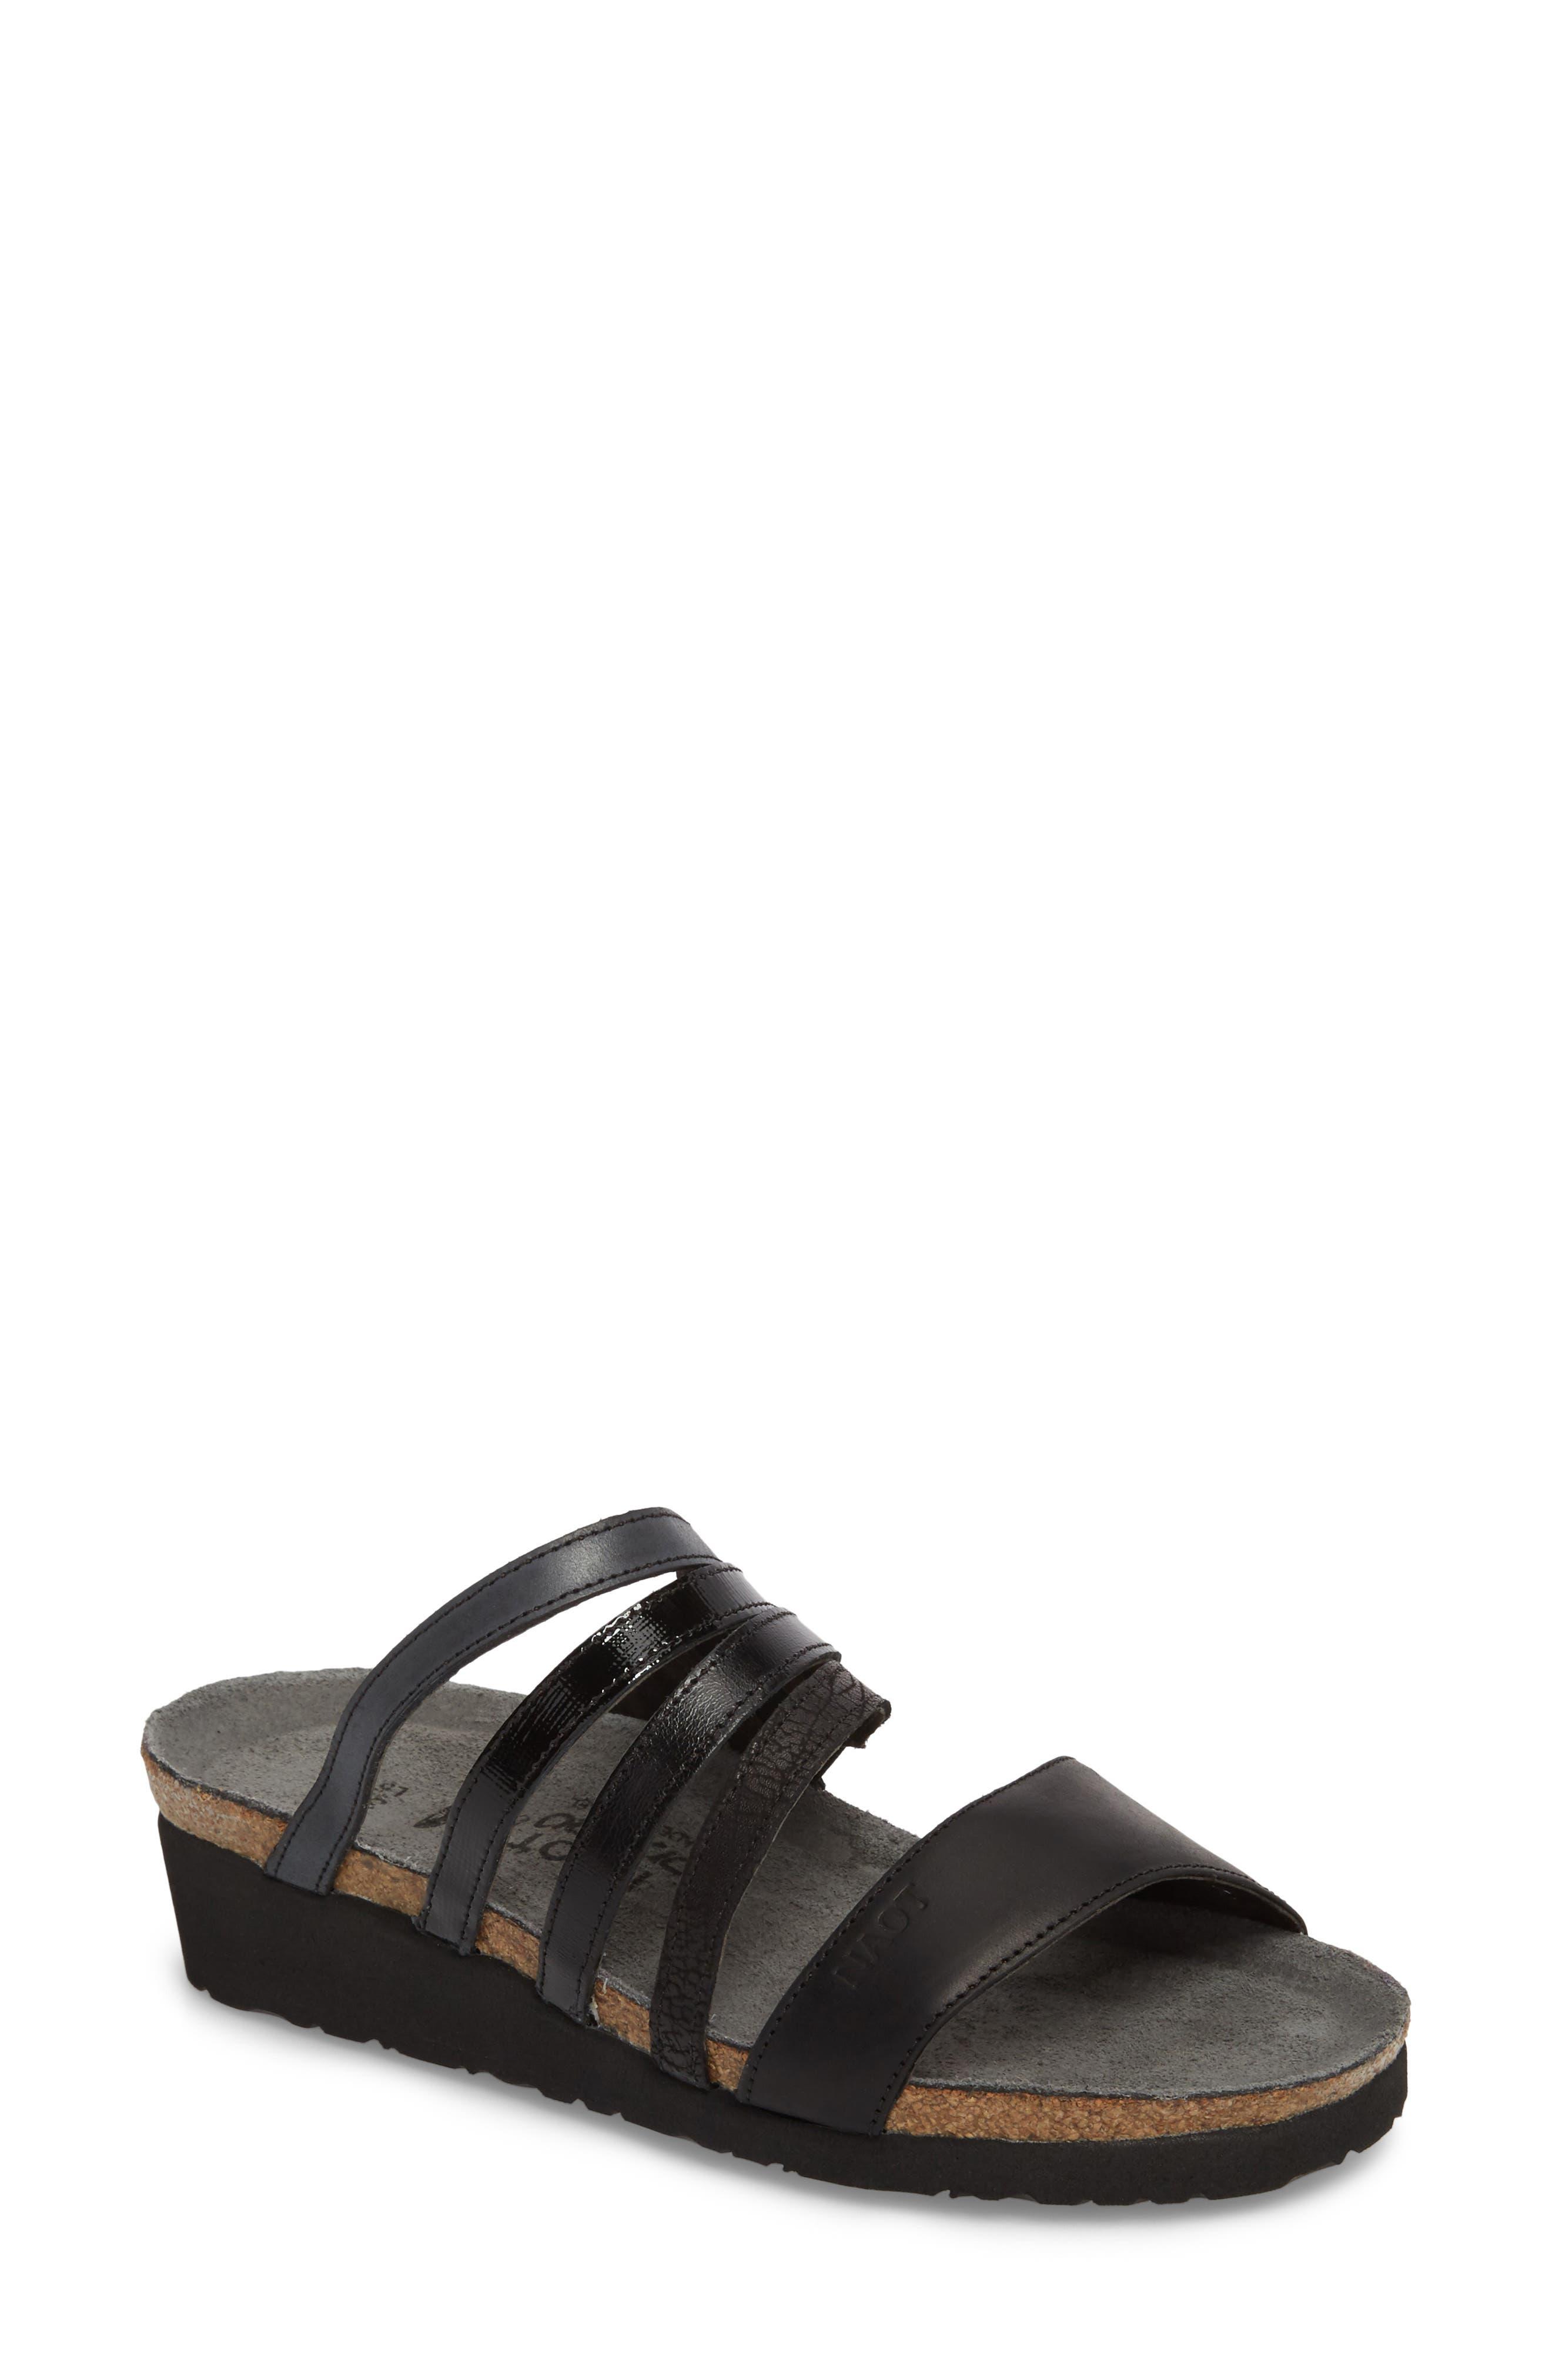 NAOT Peyton Slide Sandal, Main, color, OILY COAL NUBUCK